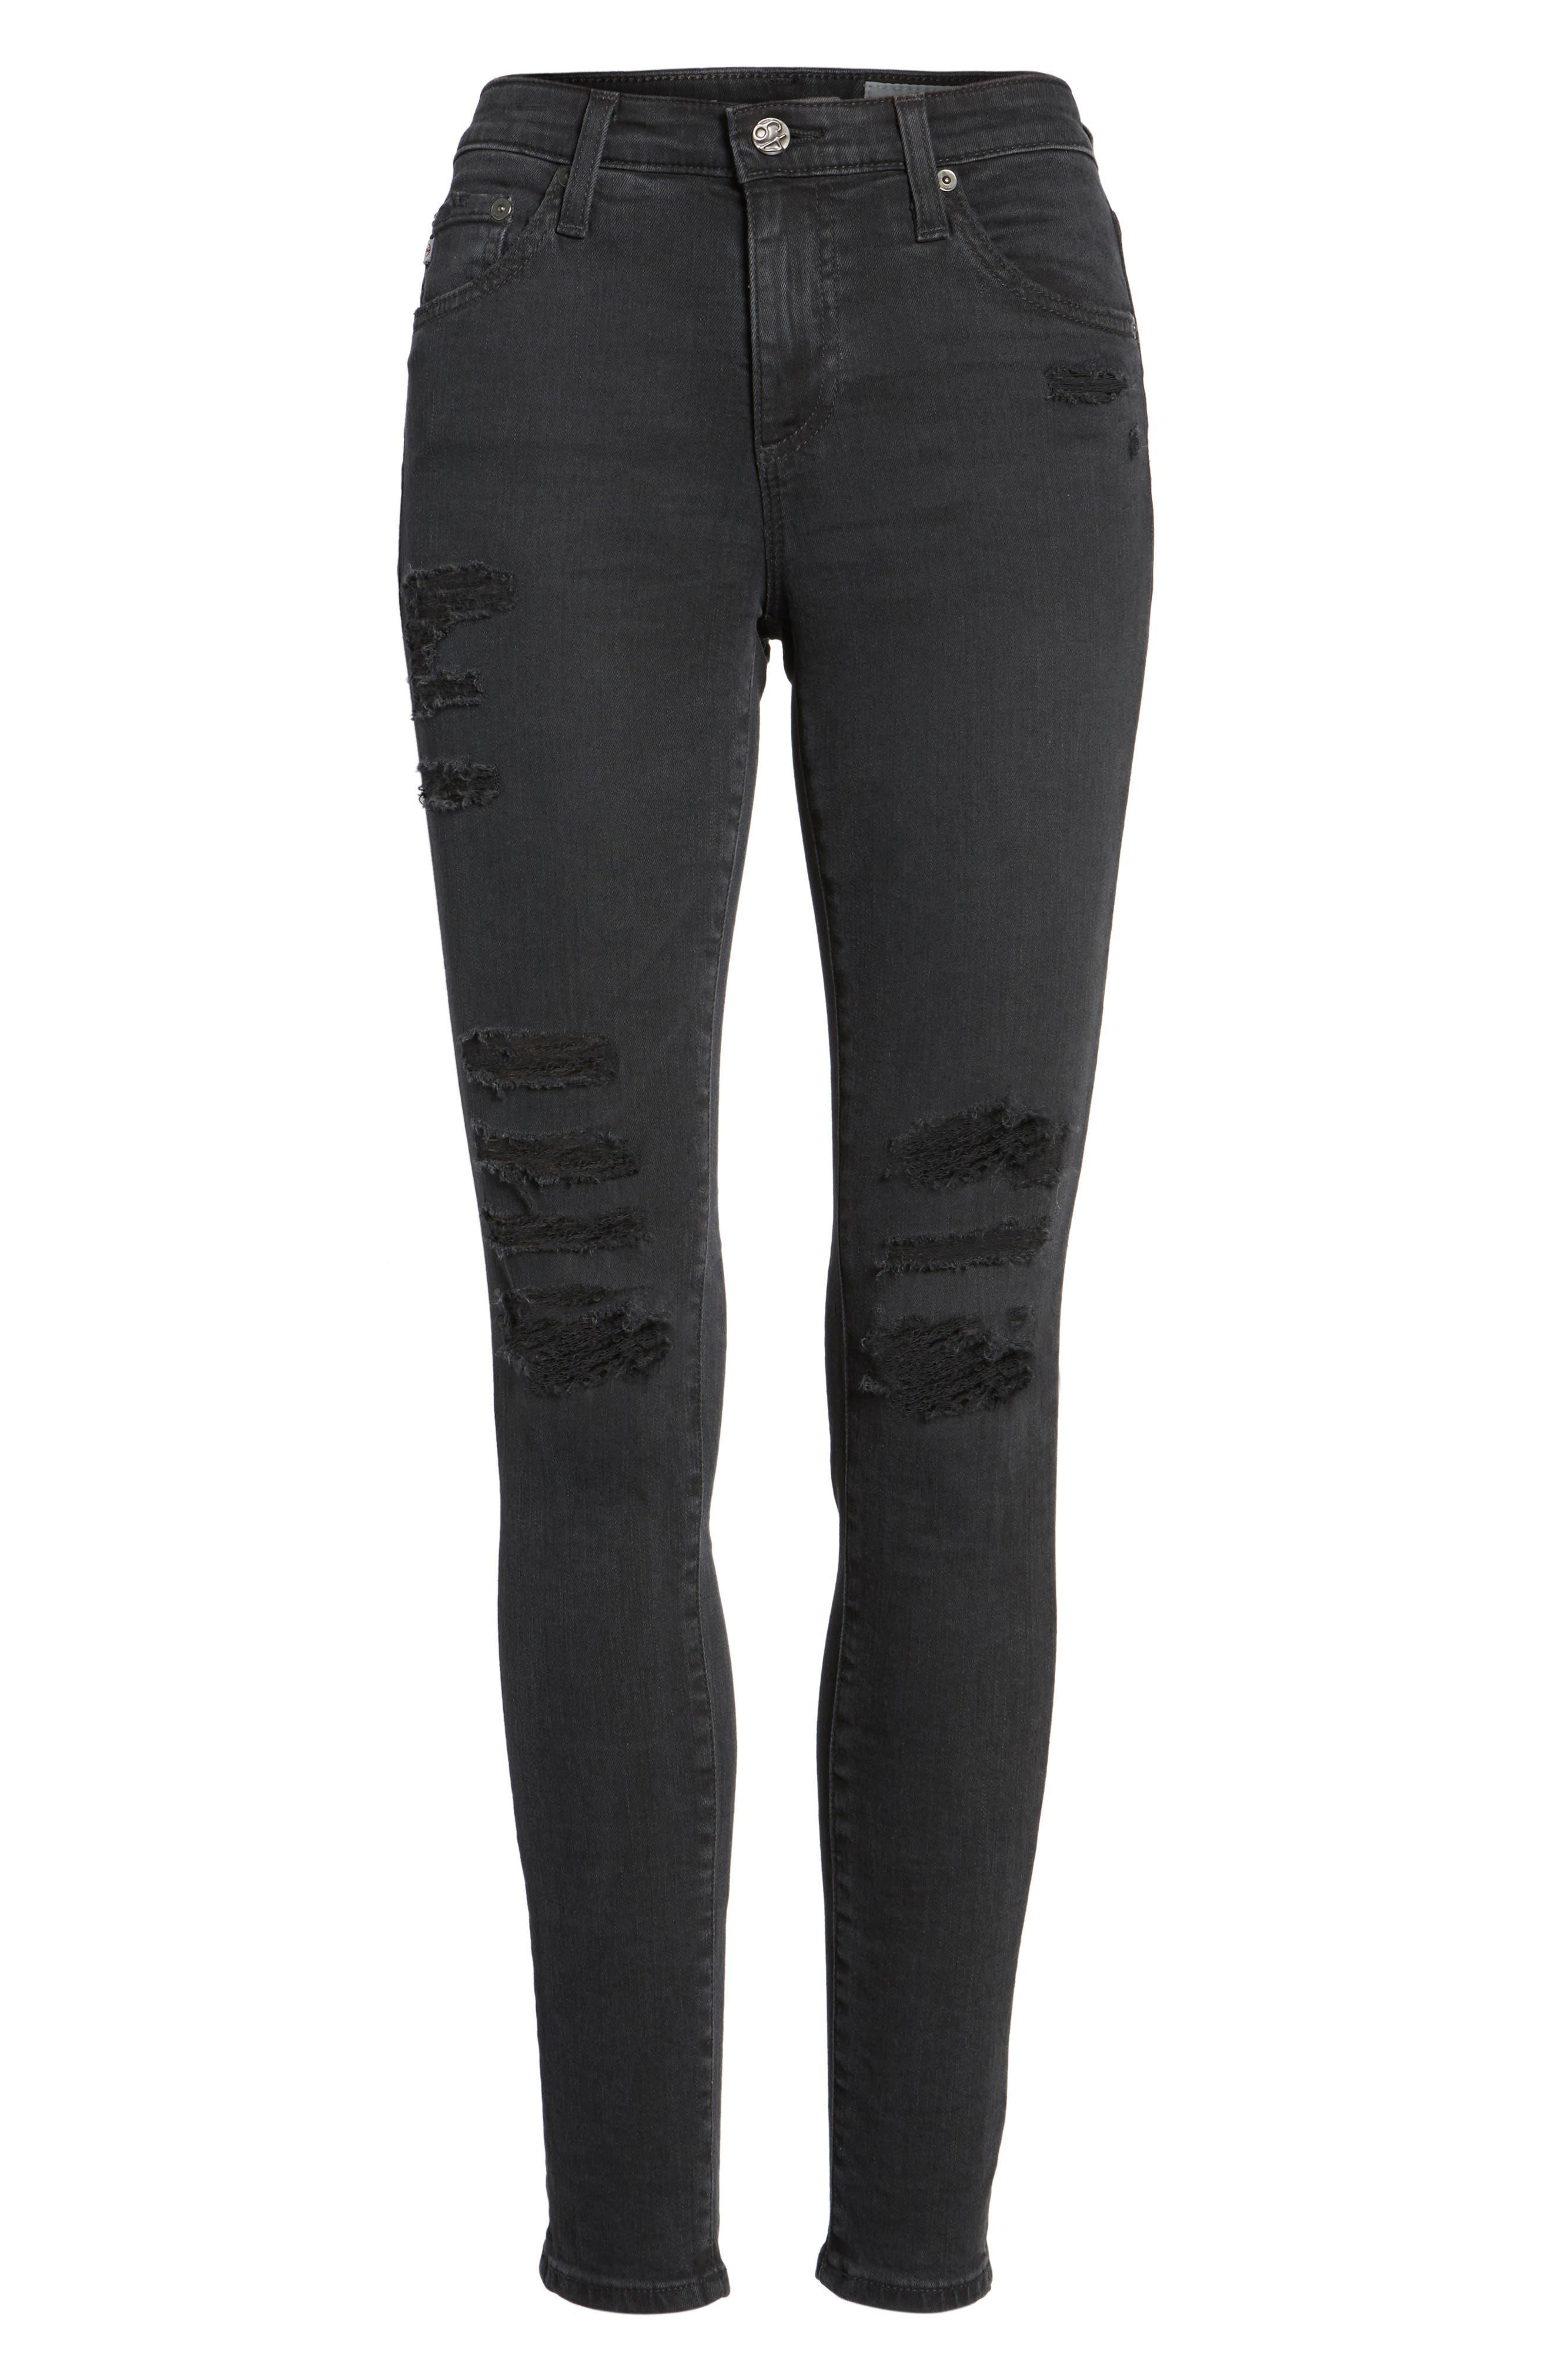 'The Legging' Ankle Super Skinny Jeans,                             Alternate thumbnail 24, color,